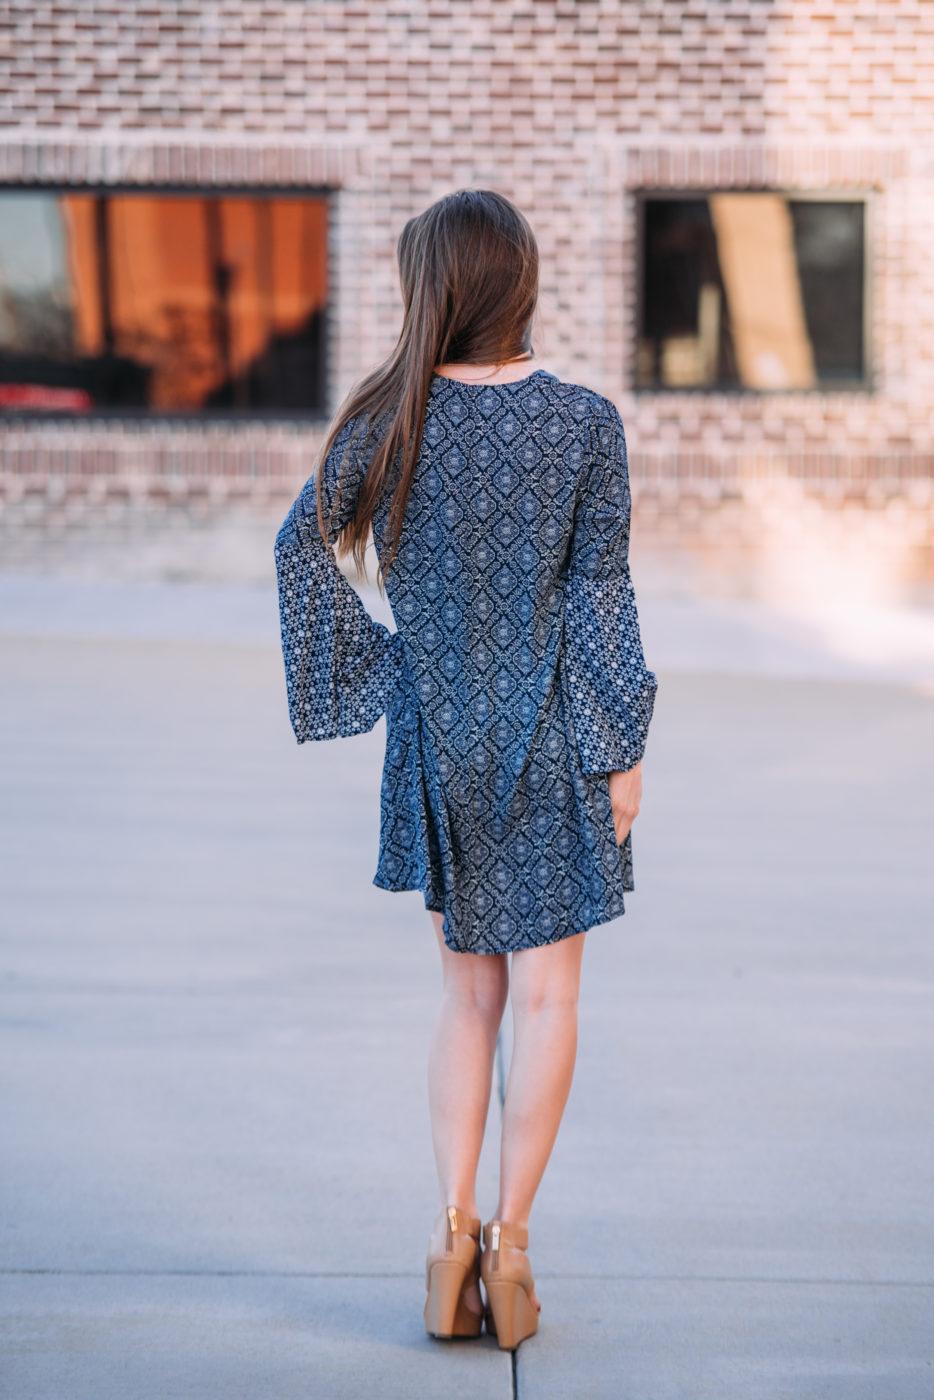 Sapphire Storm Dress